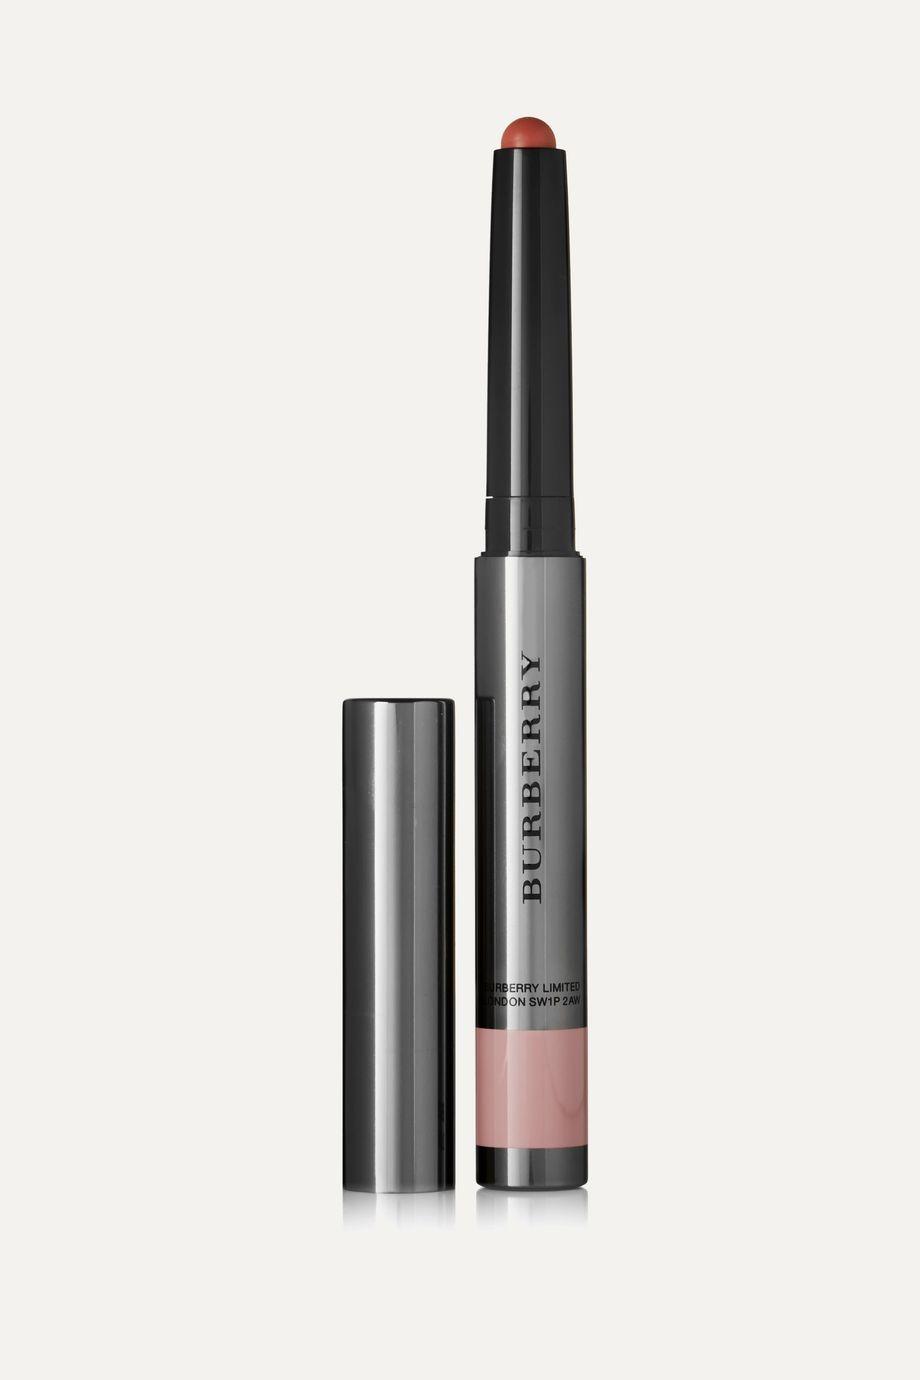 Burberry Beauty Lip Color Contour - Fair No.01